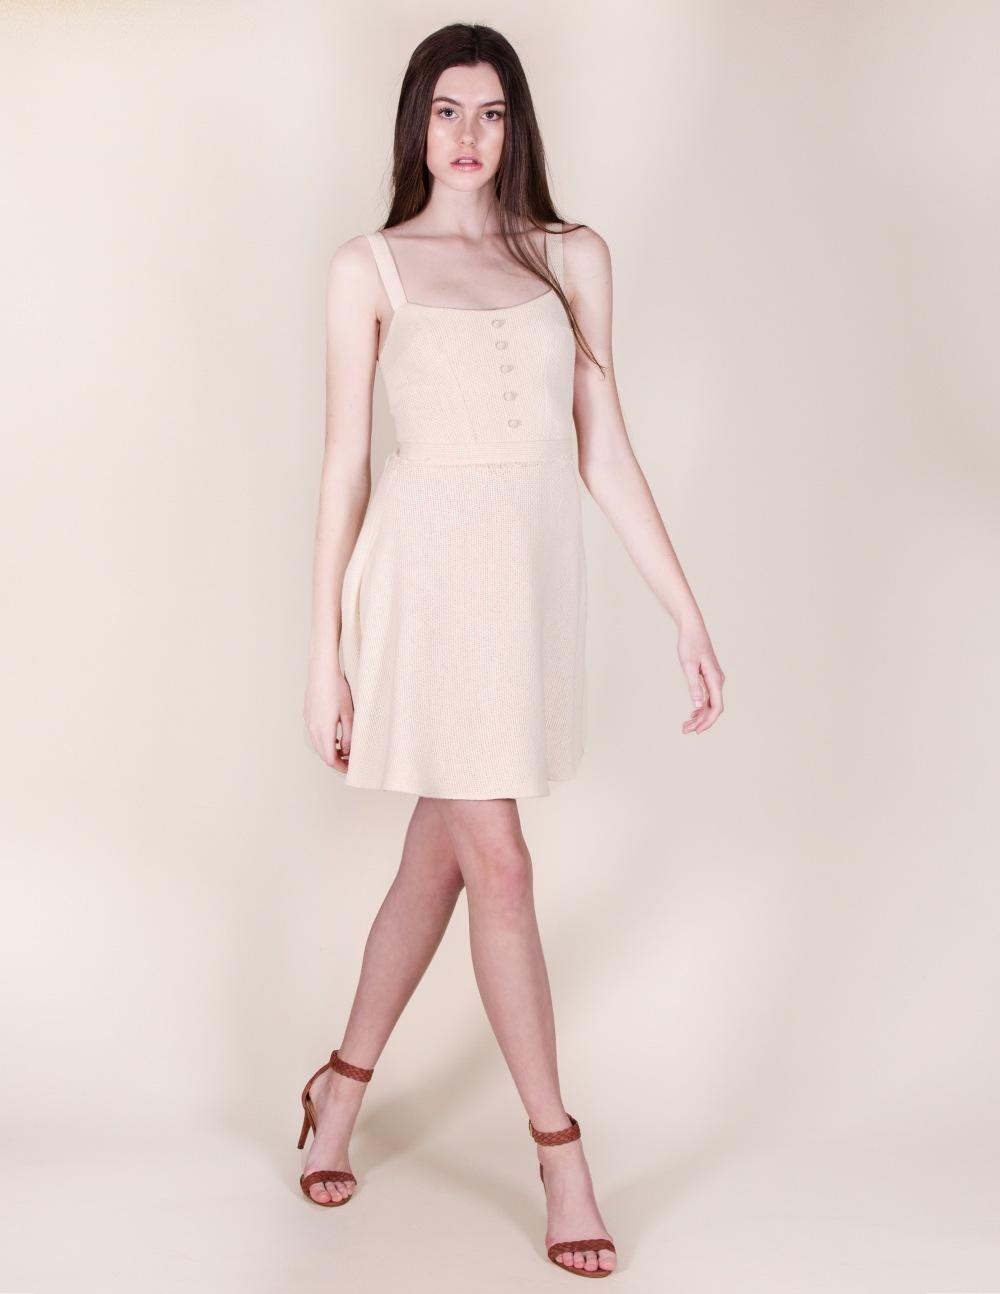 Alyssa Nicole The Nina Dress 1